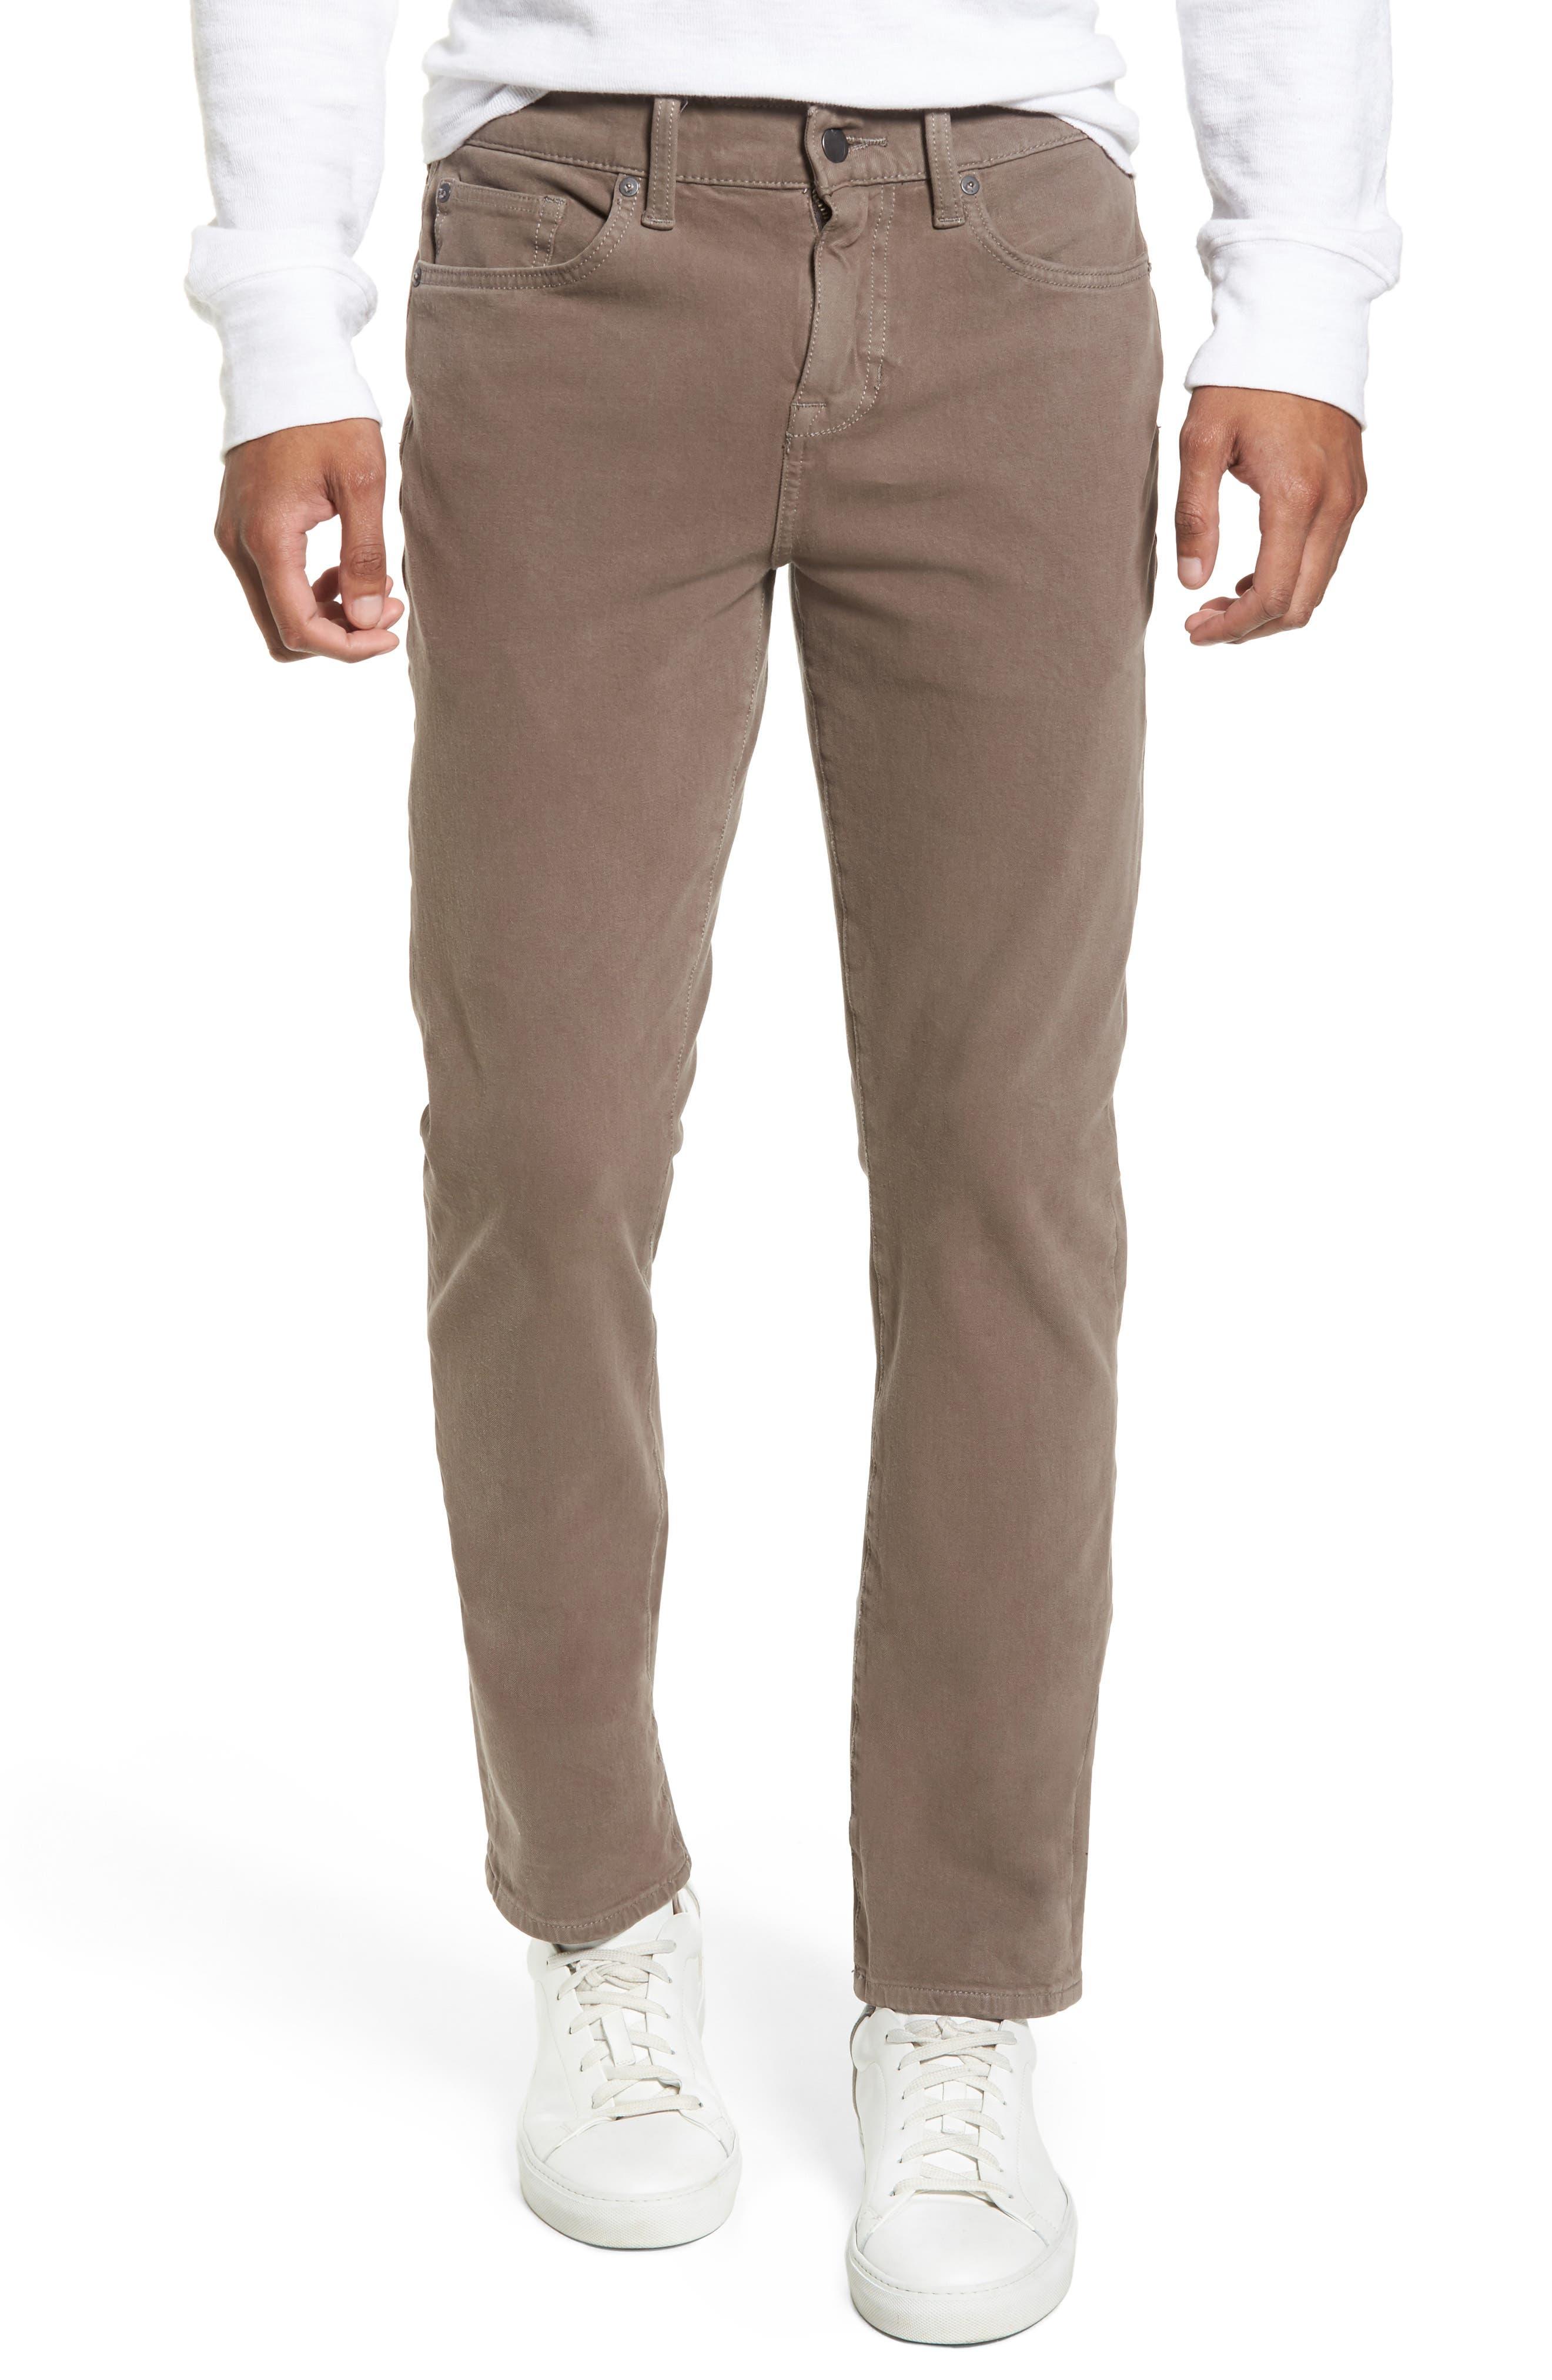 Kinetic Slim Fit Jeans,                         Main,                         color, Stonehenge